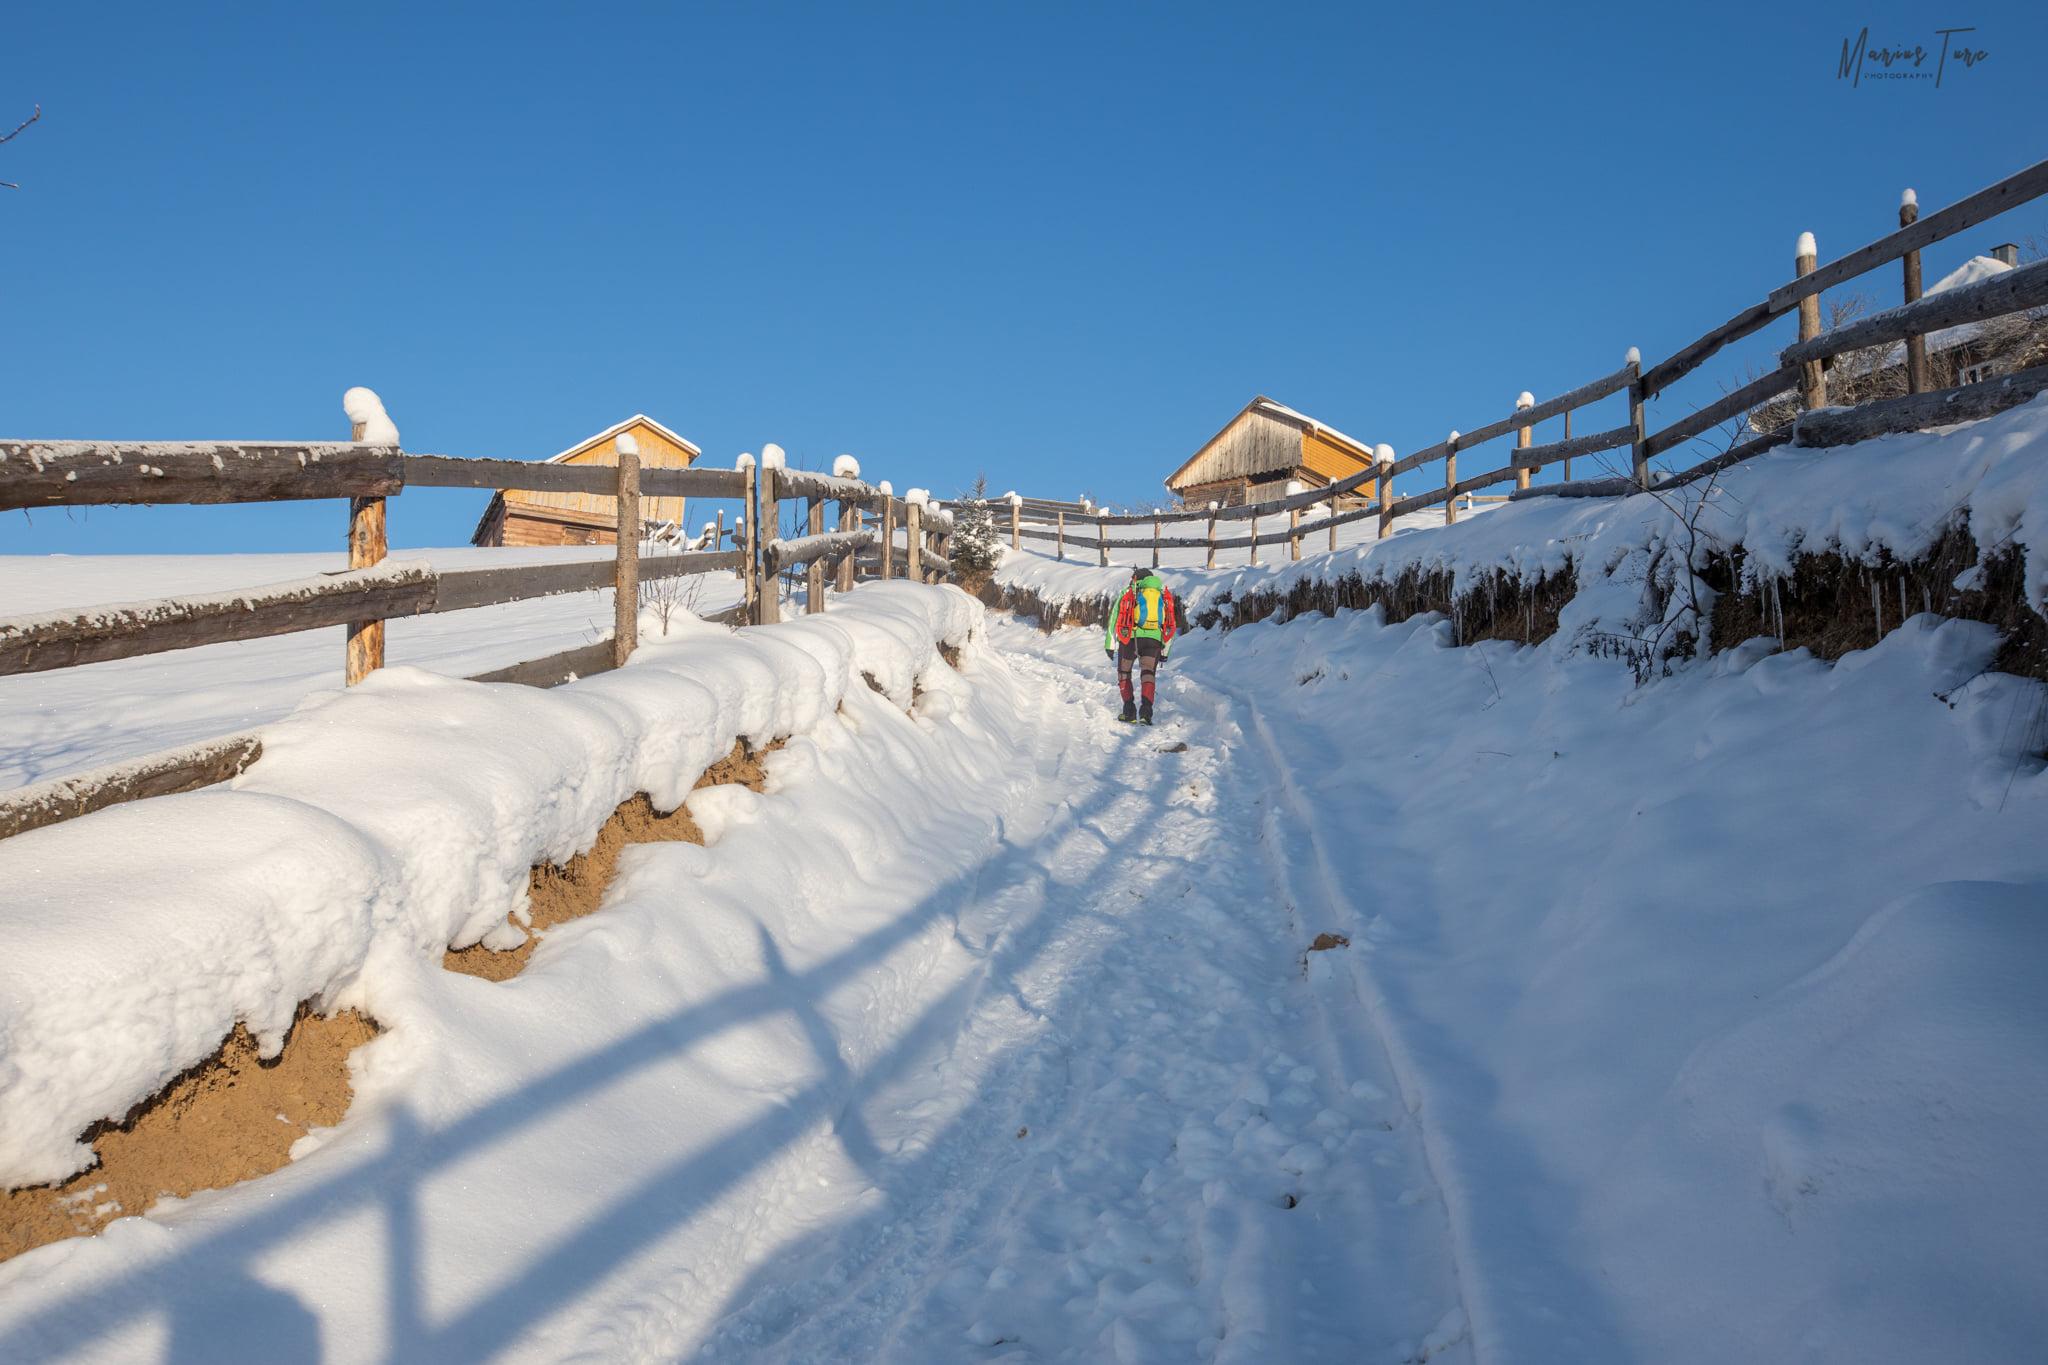 Un drum frumos printre gardurile motilor - Marius Turc